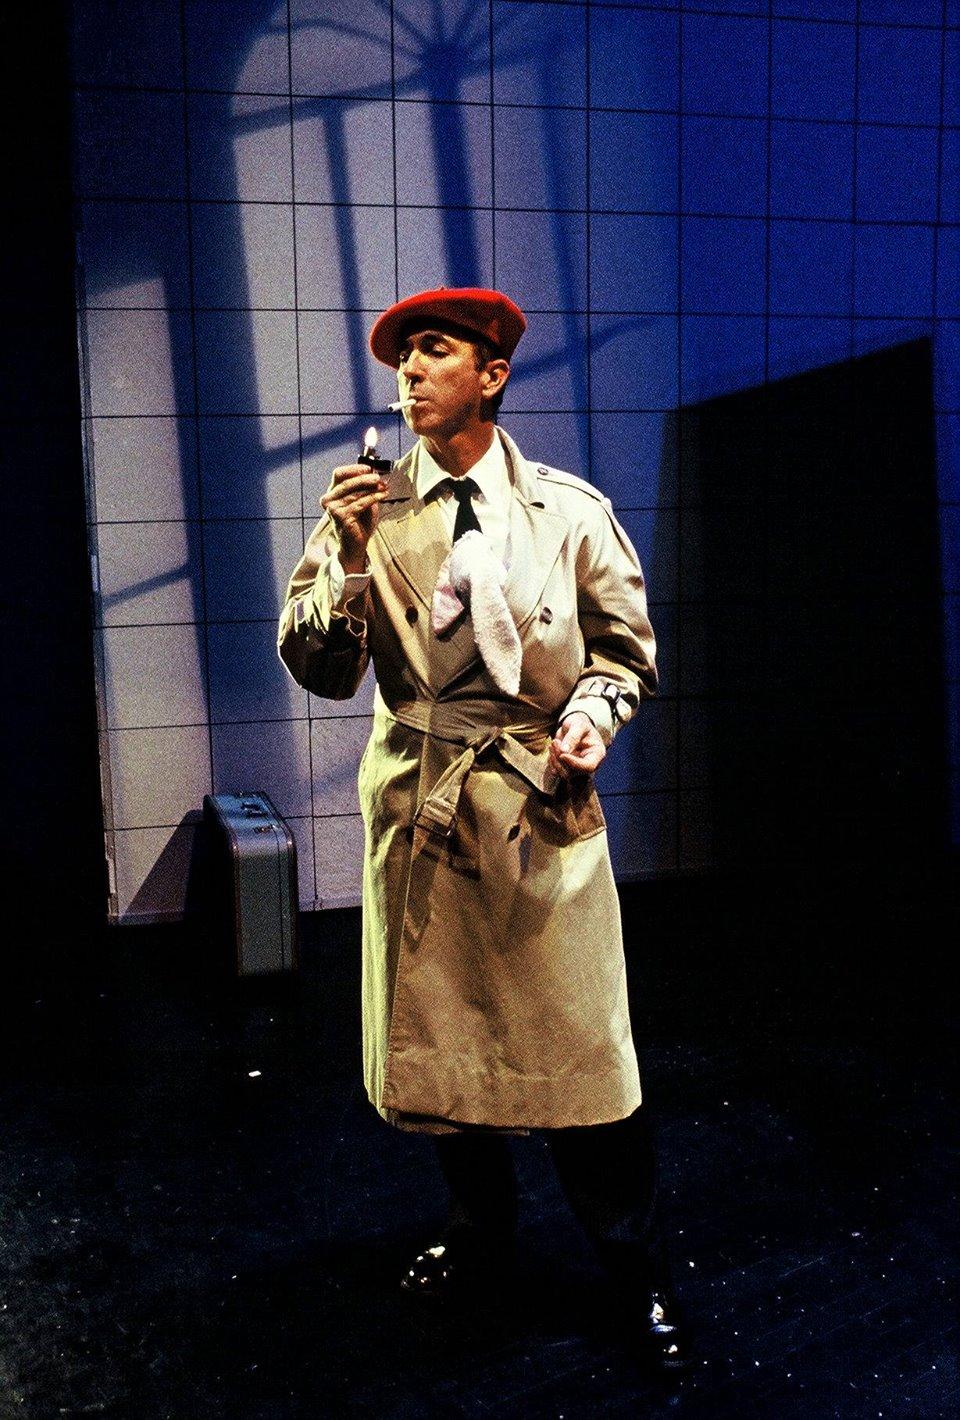 Actors Theatre, 1999-2001, The Baltimore Waltz, Jon Gentry (Photo credit unknown)